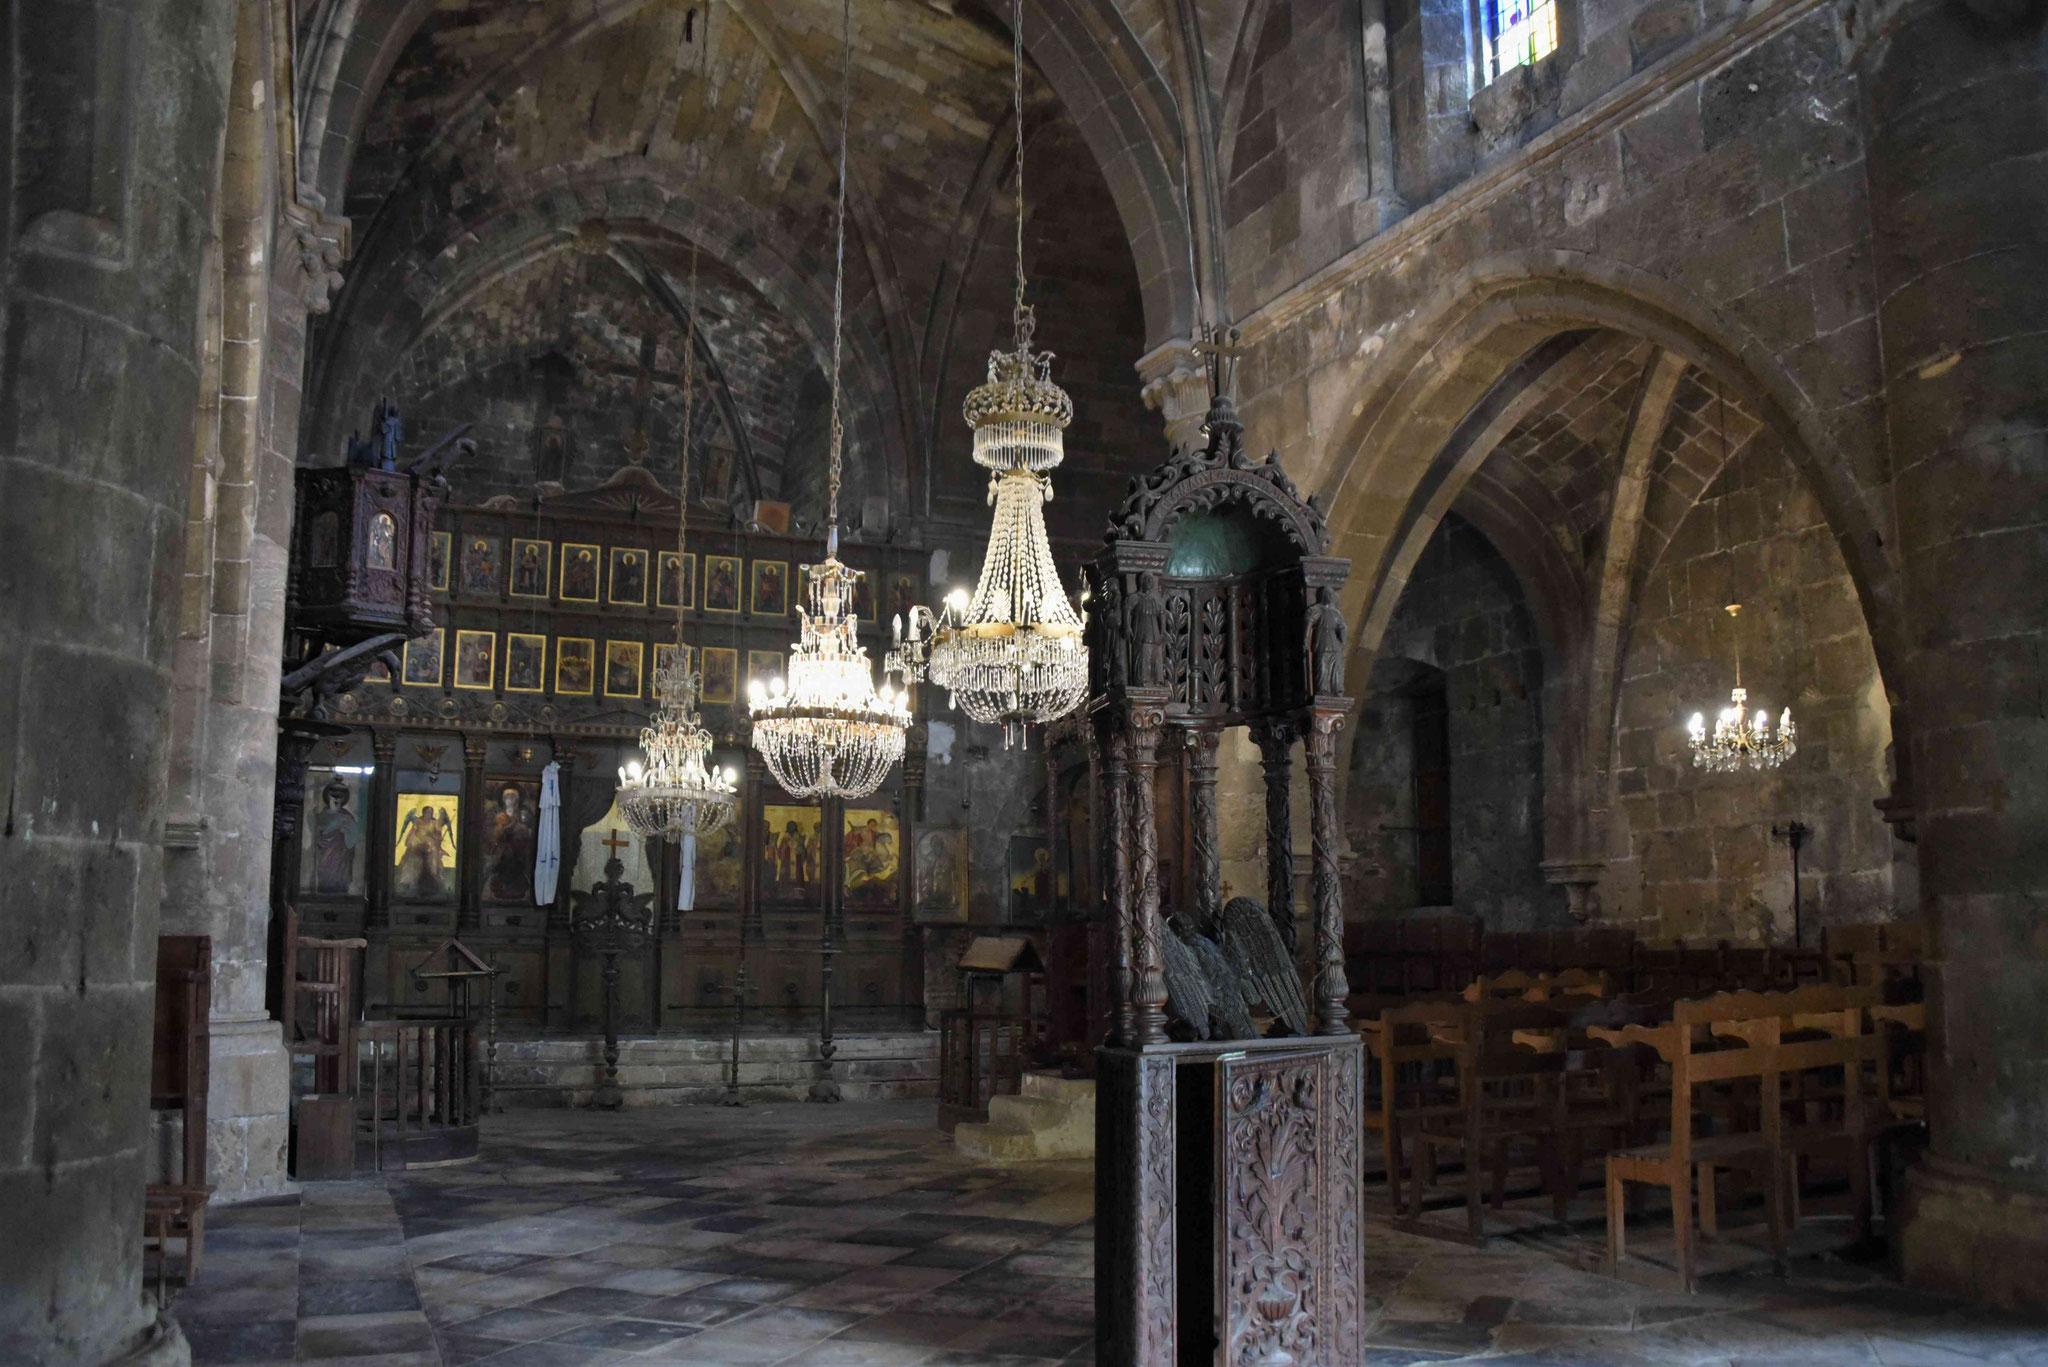 Im Inneren der Klosterkirche I